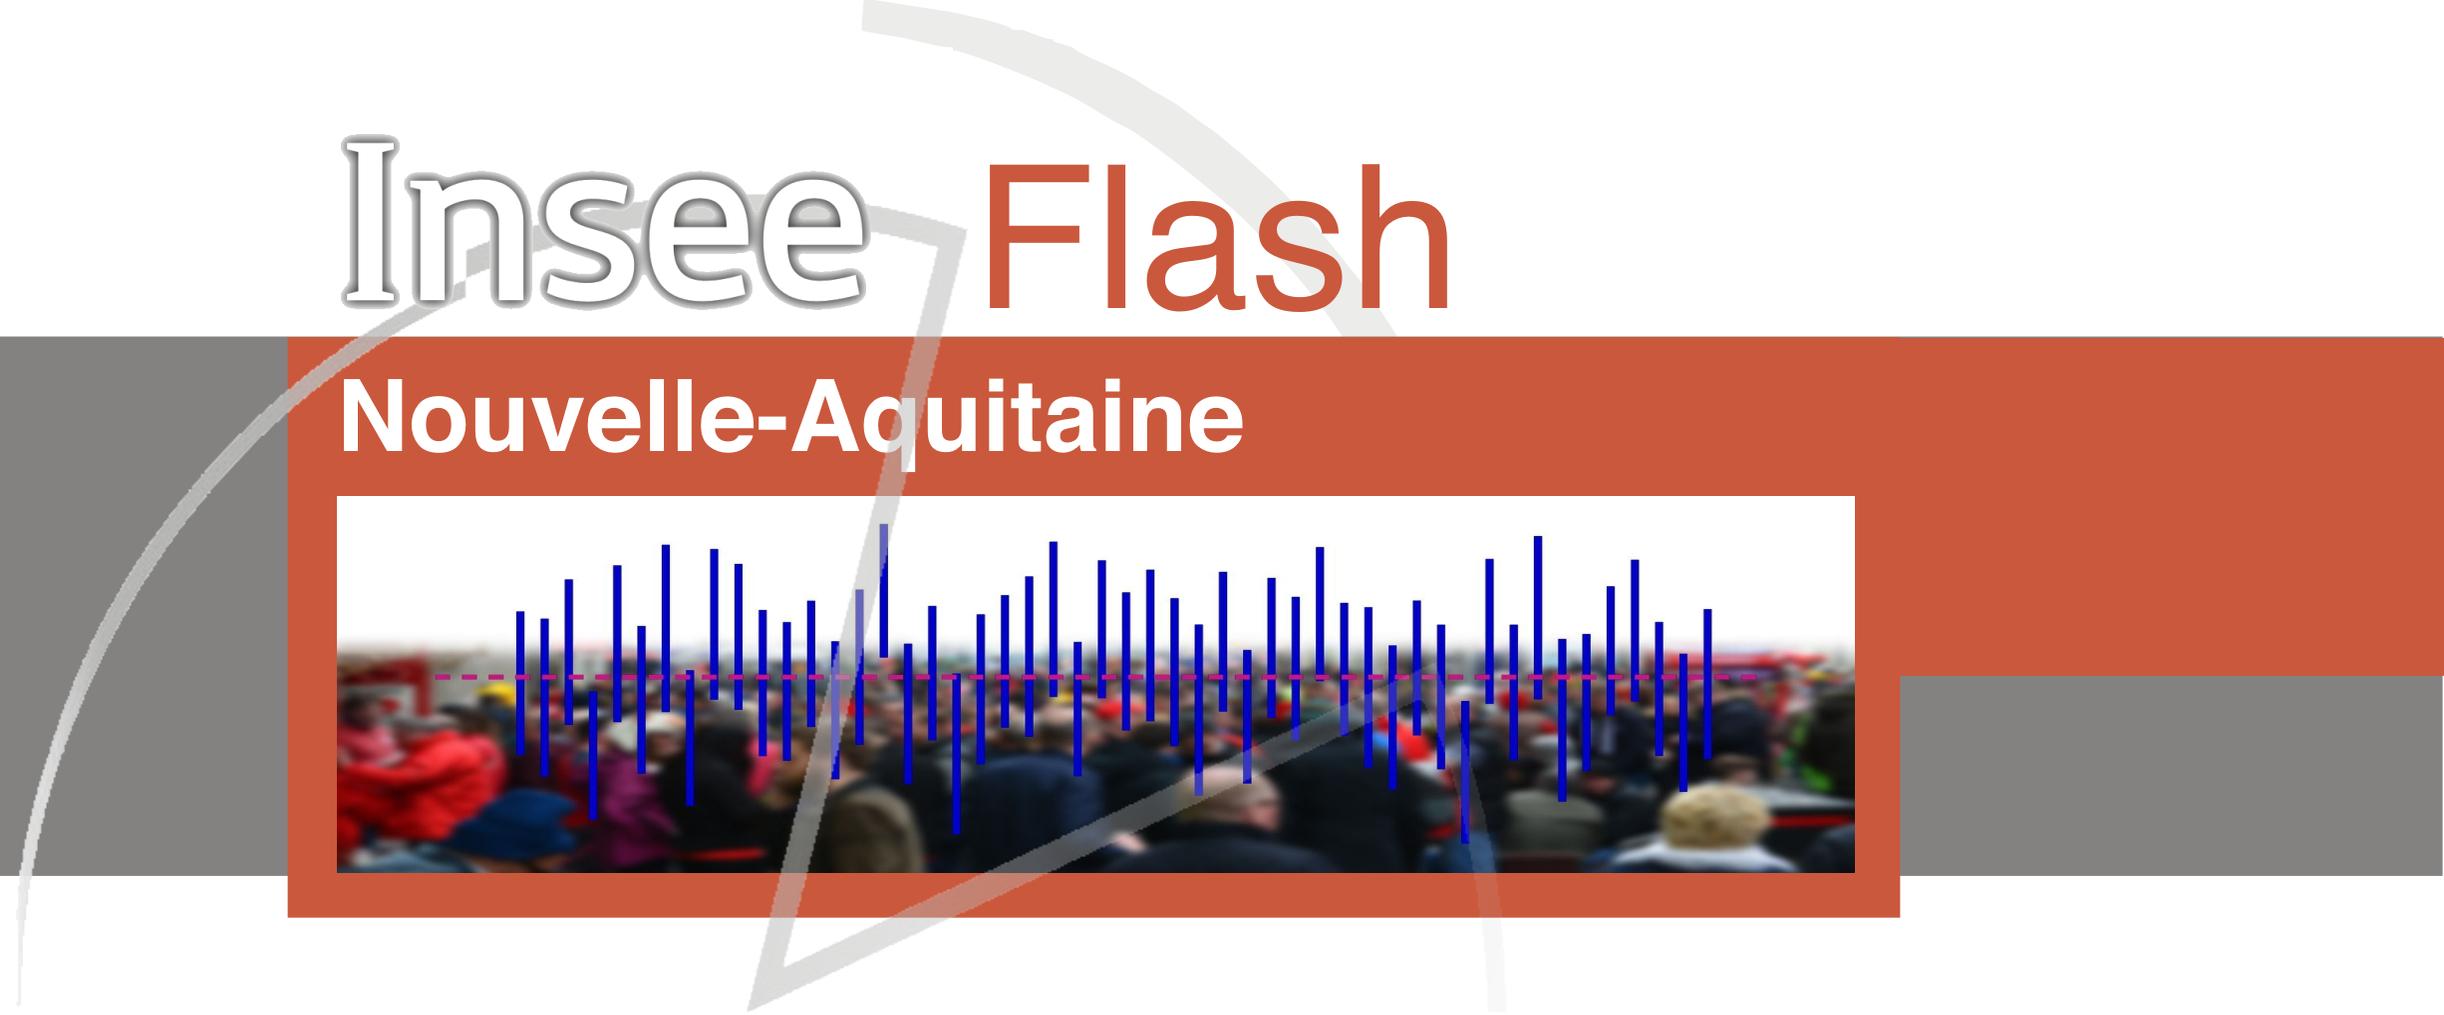 A Quarter Of Britons Living In France Are In Nouvelle concernant Nouvelle Region France